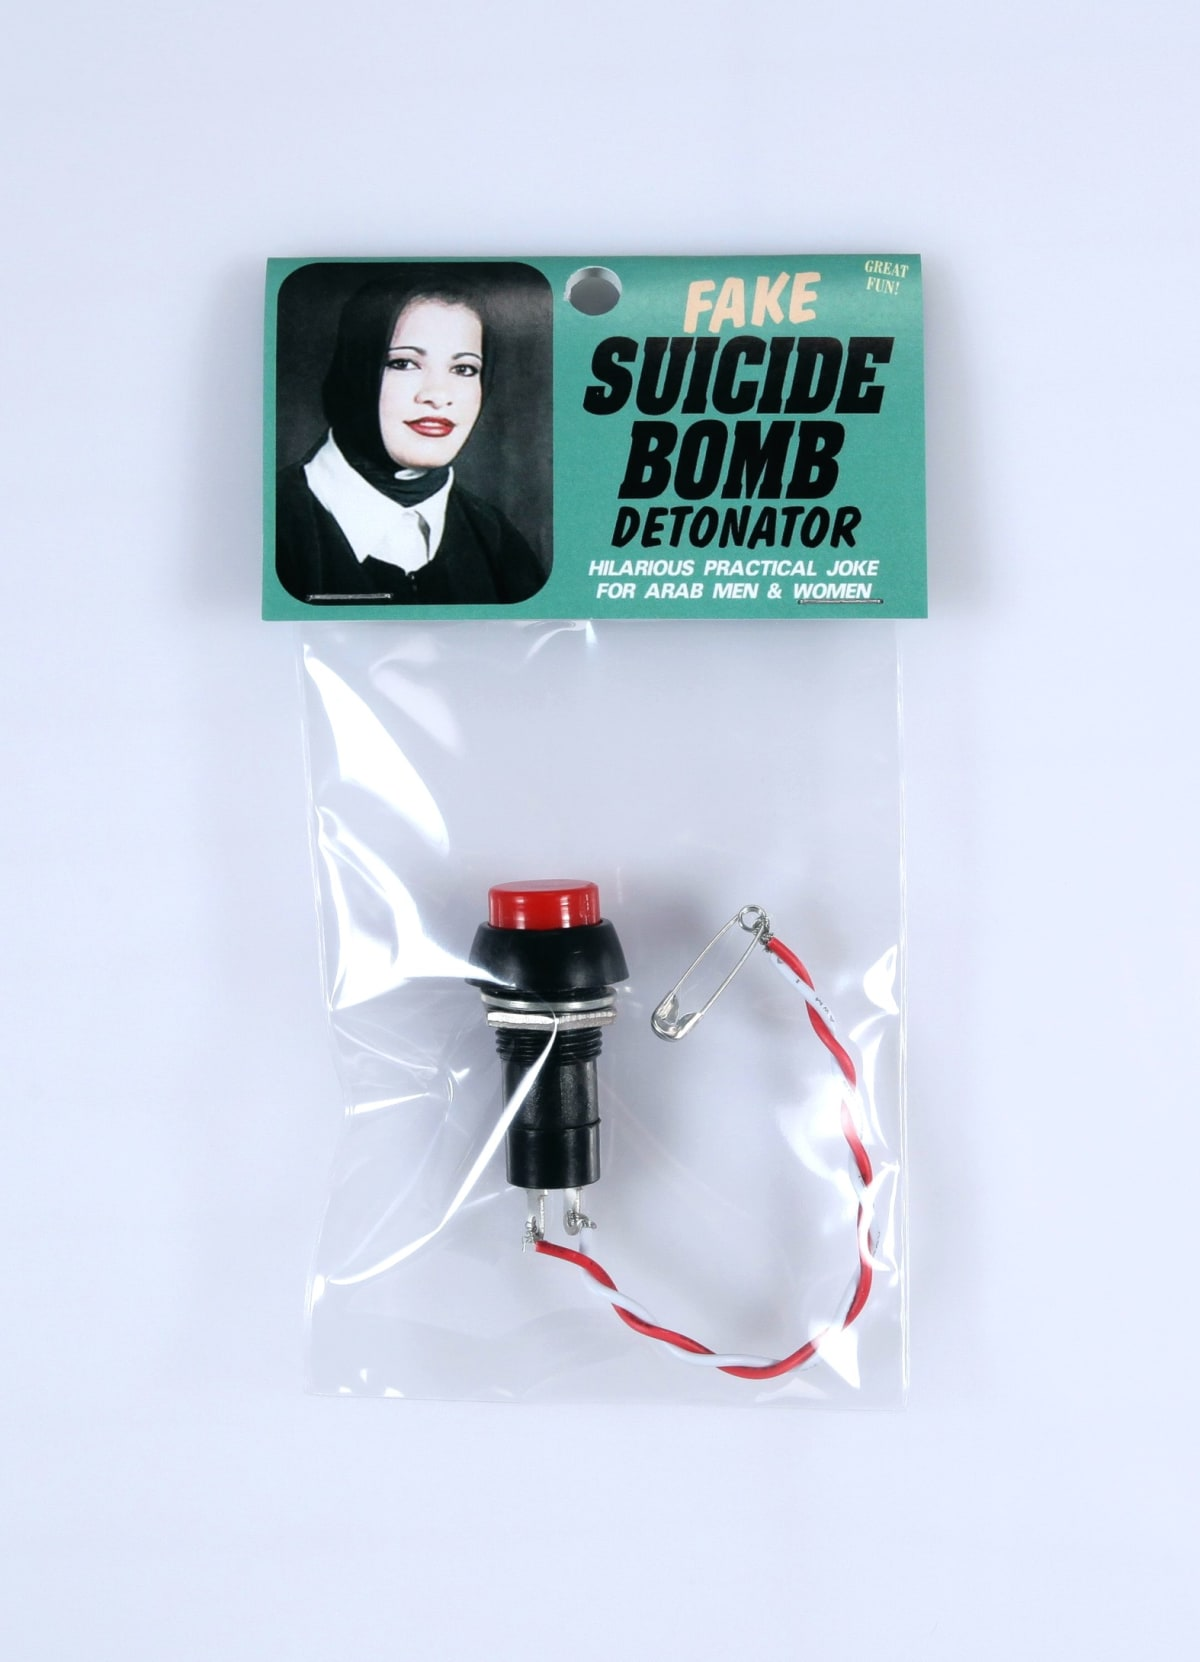 Fake suicide bomb detonator, 2011